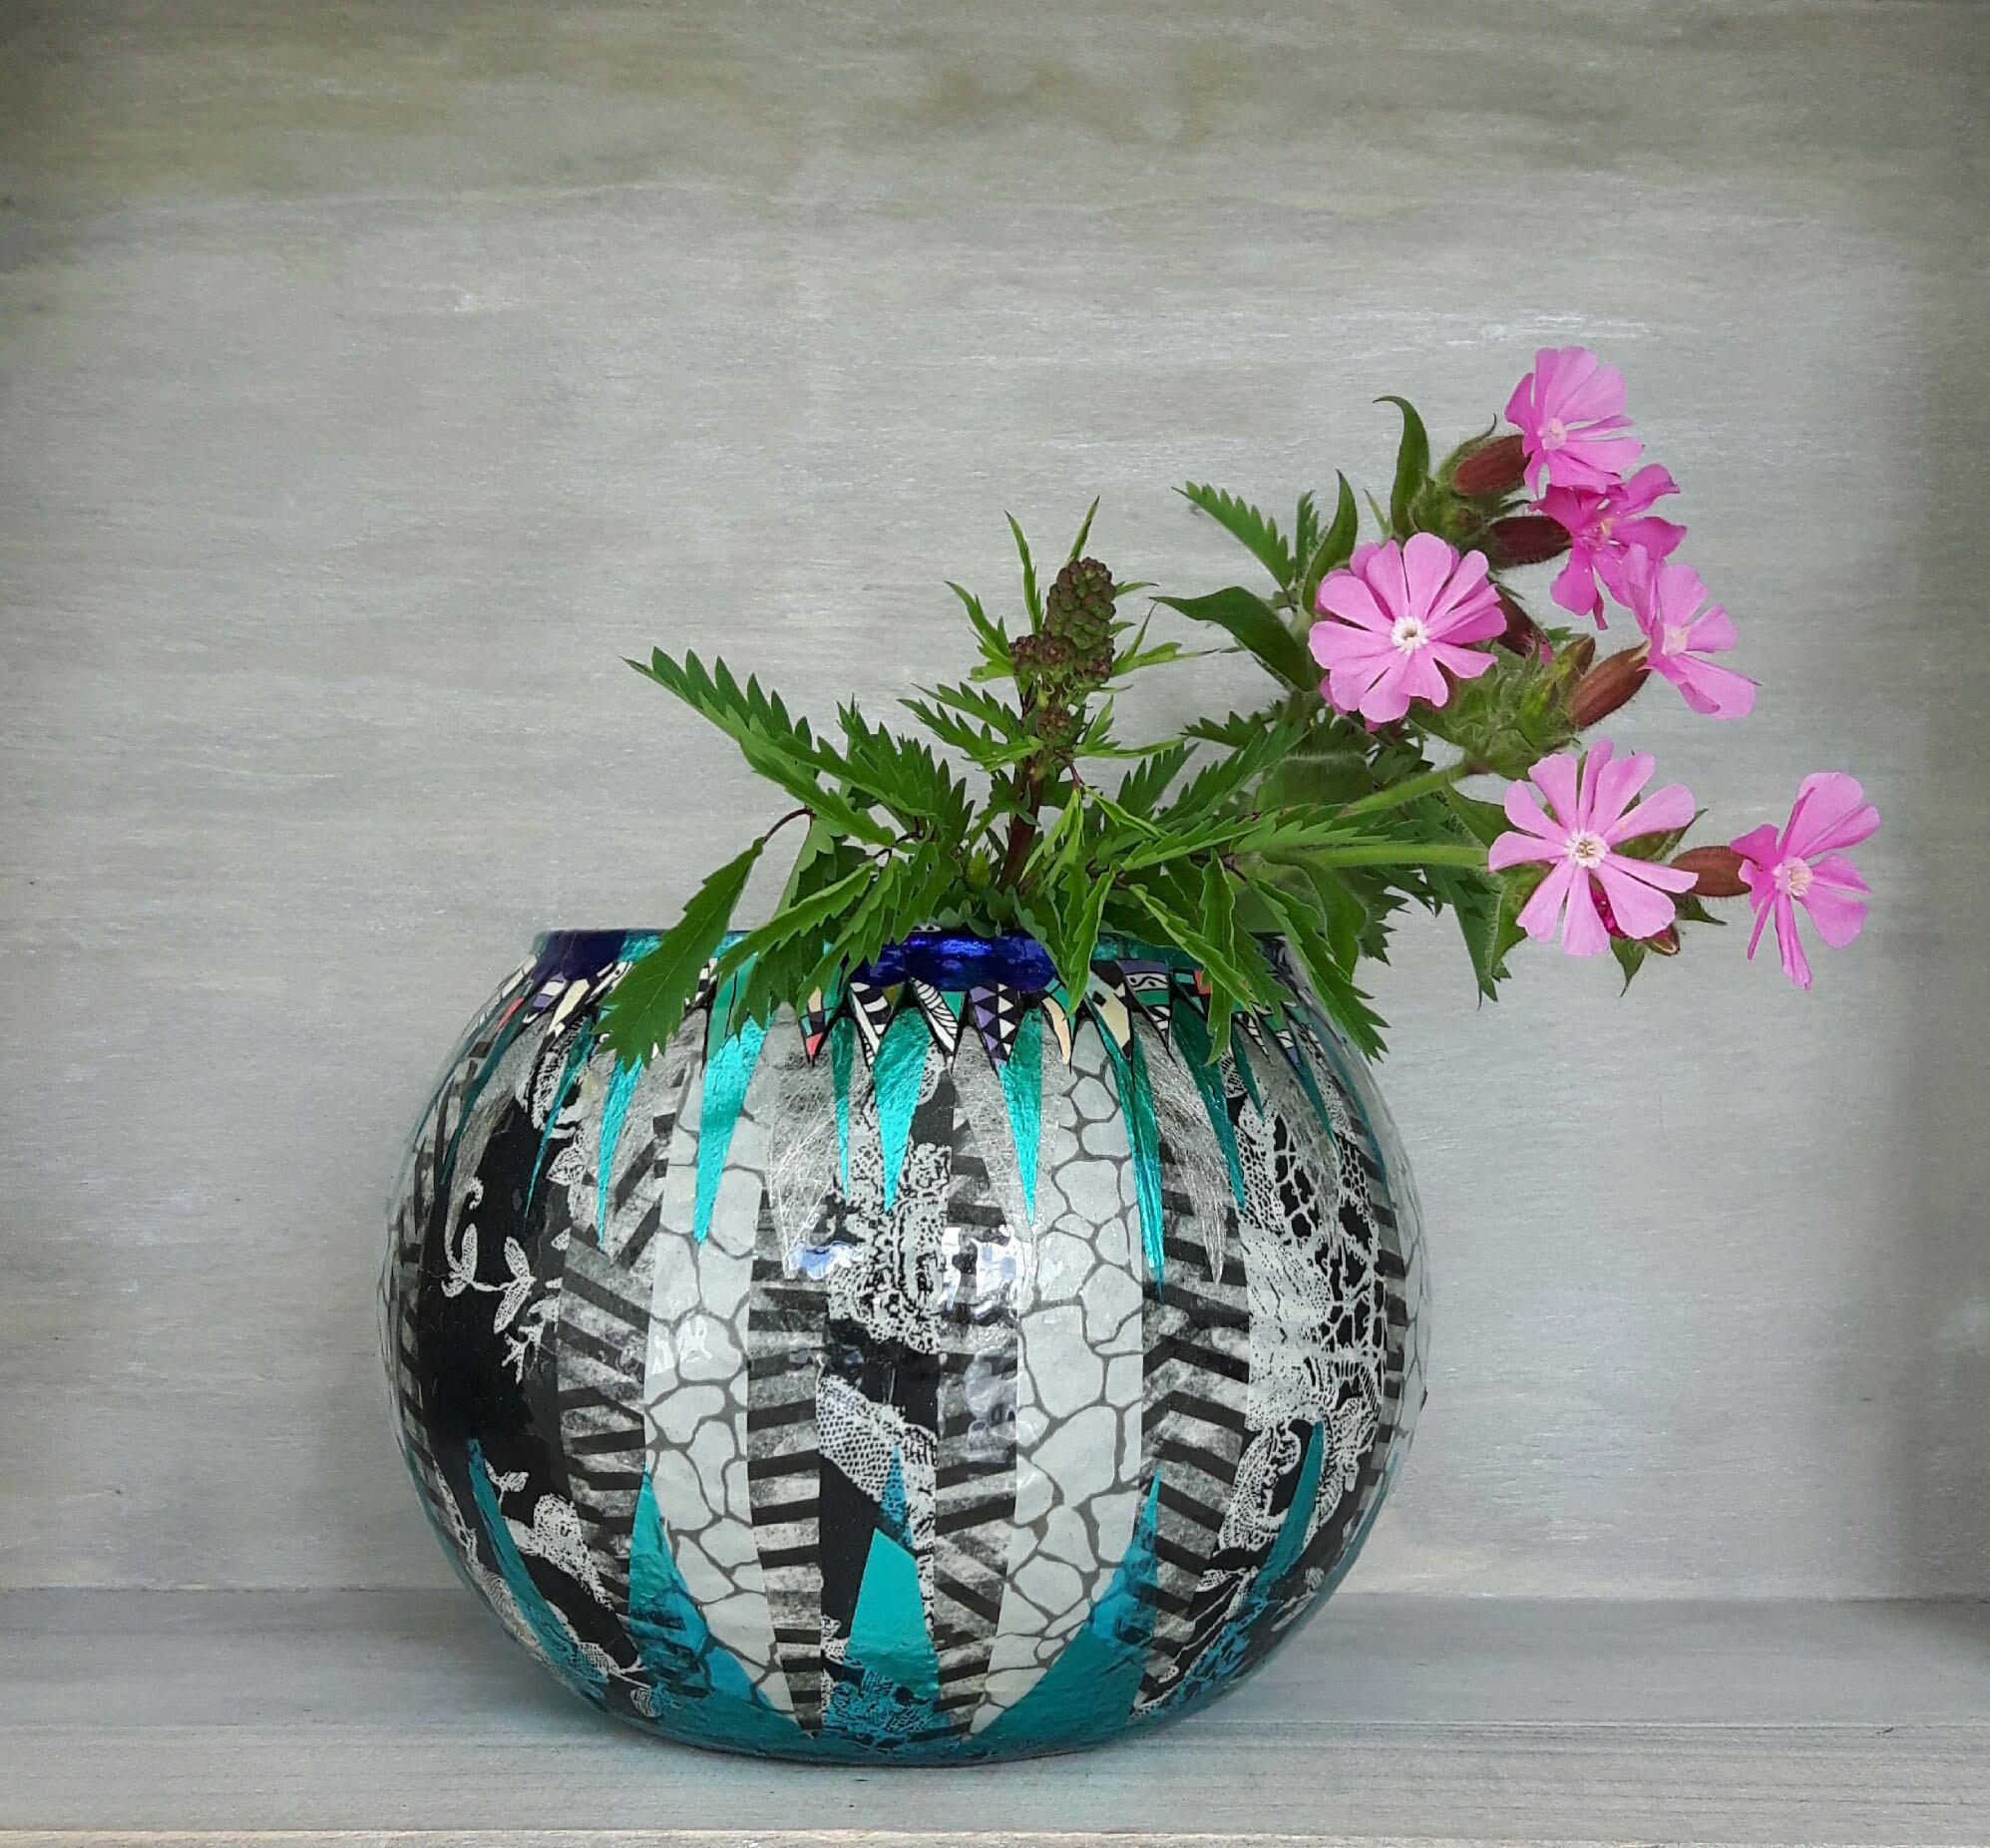 uk glass interior photo on decorating decorative cool amazing for decor design nice beads wonderfull house vases home and